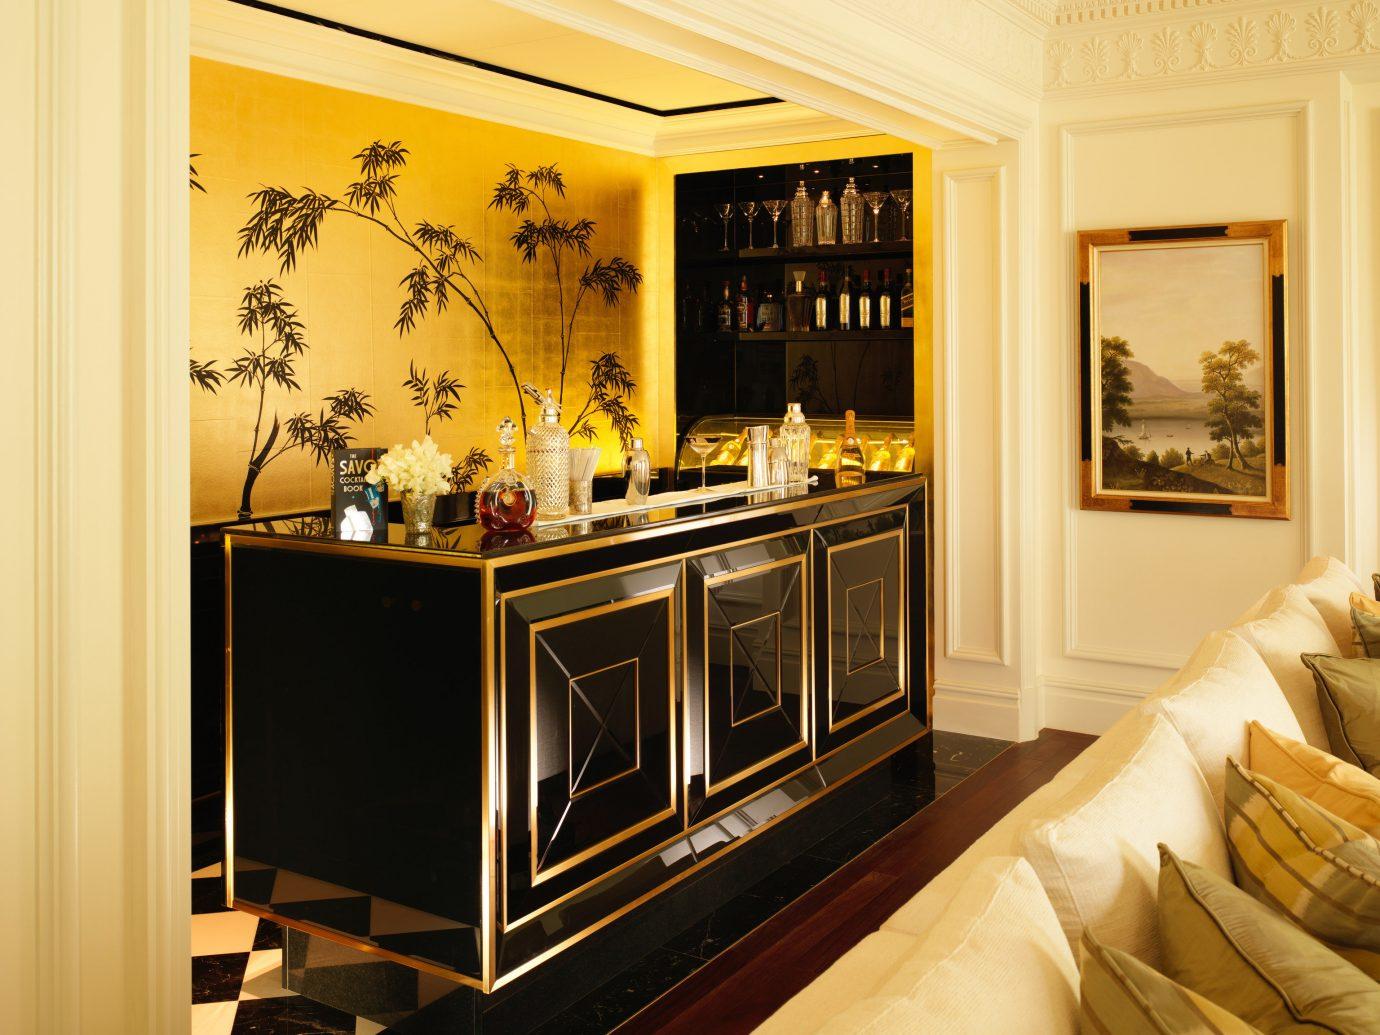 Hotels Luxury Travel indoor wall room Living floor window interior design ceiling furniture Suite decorated